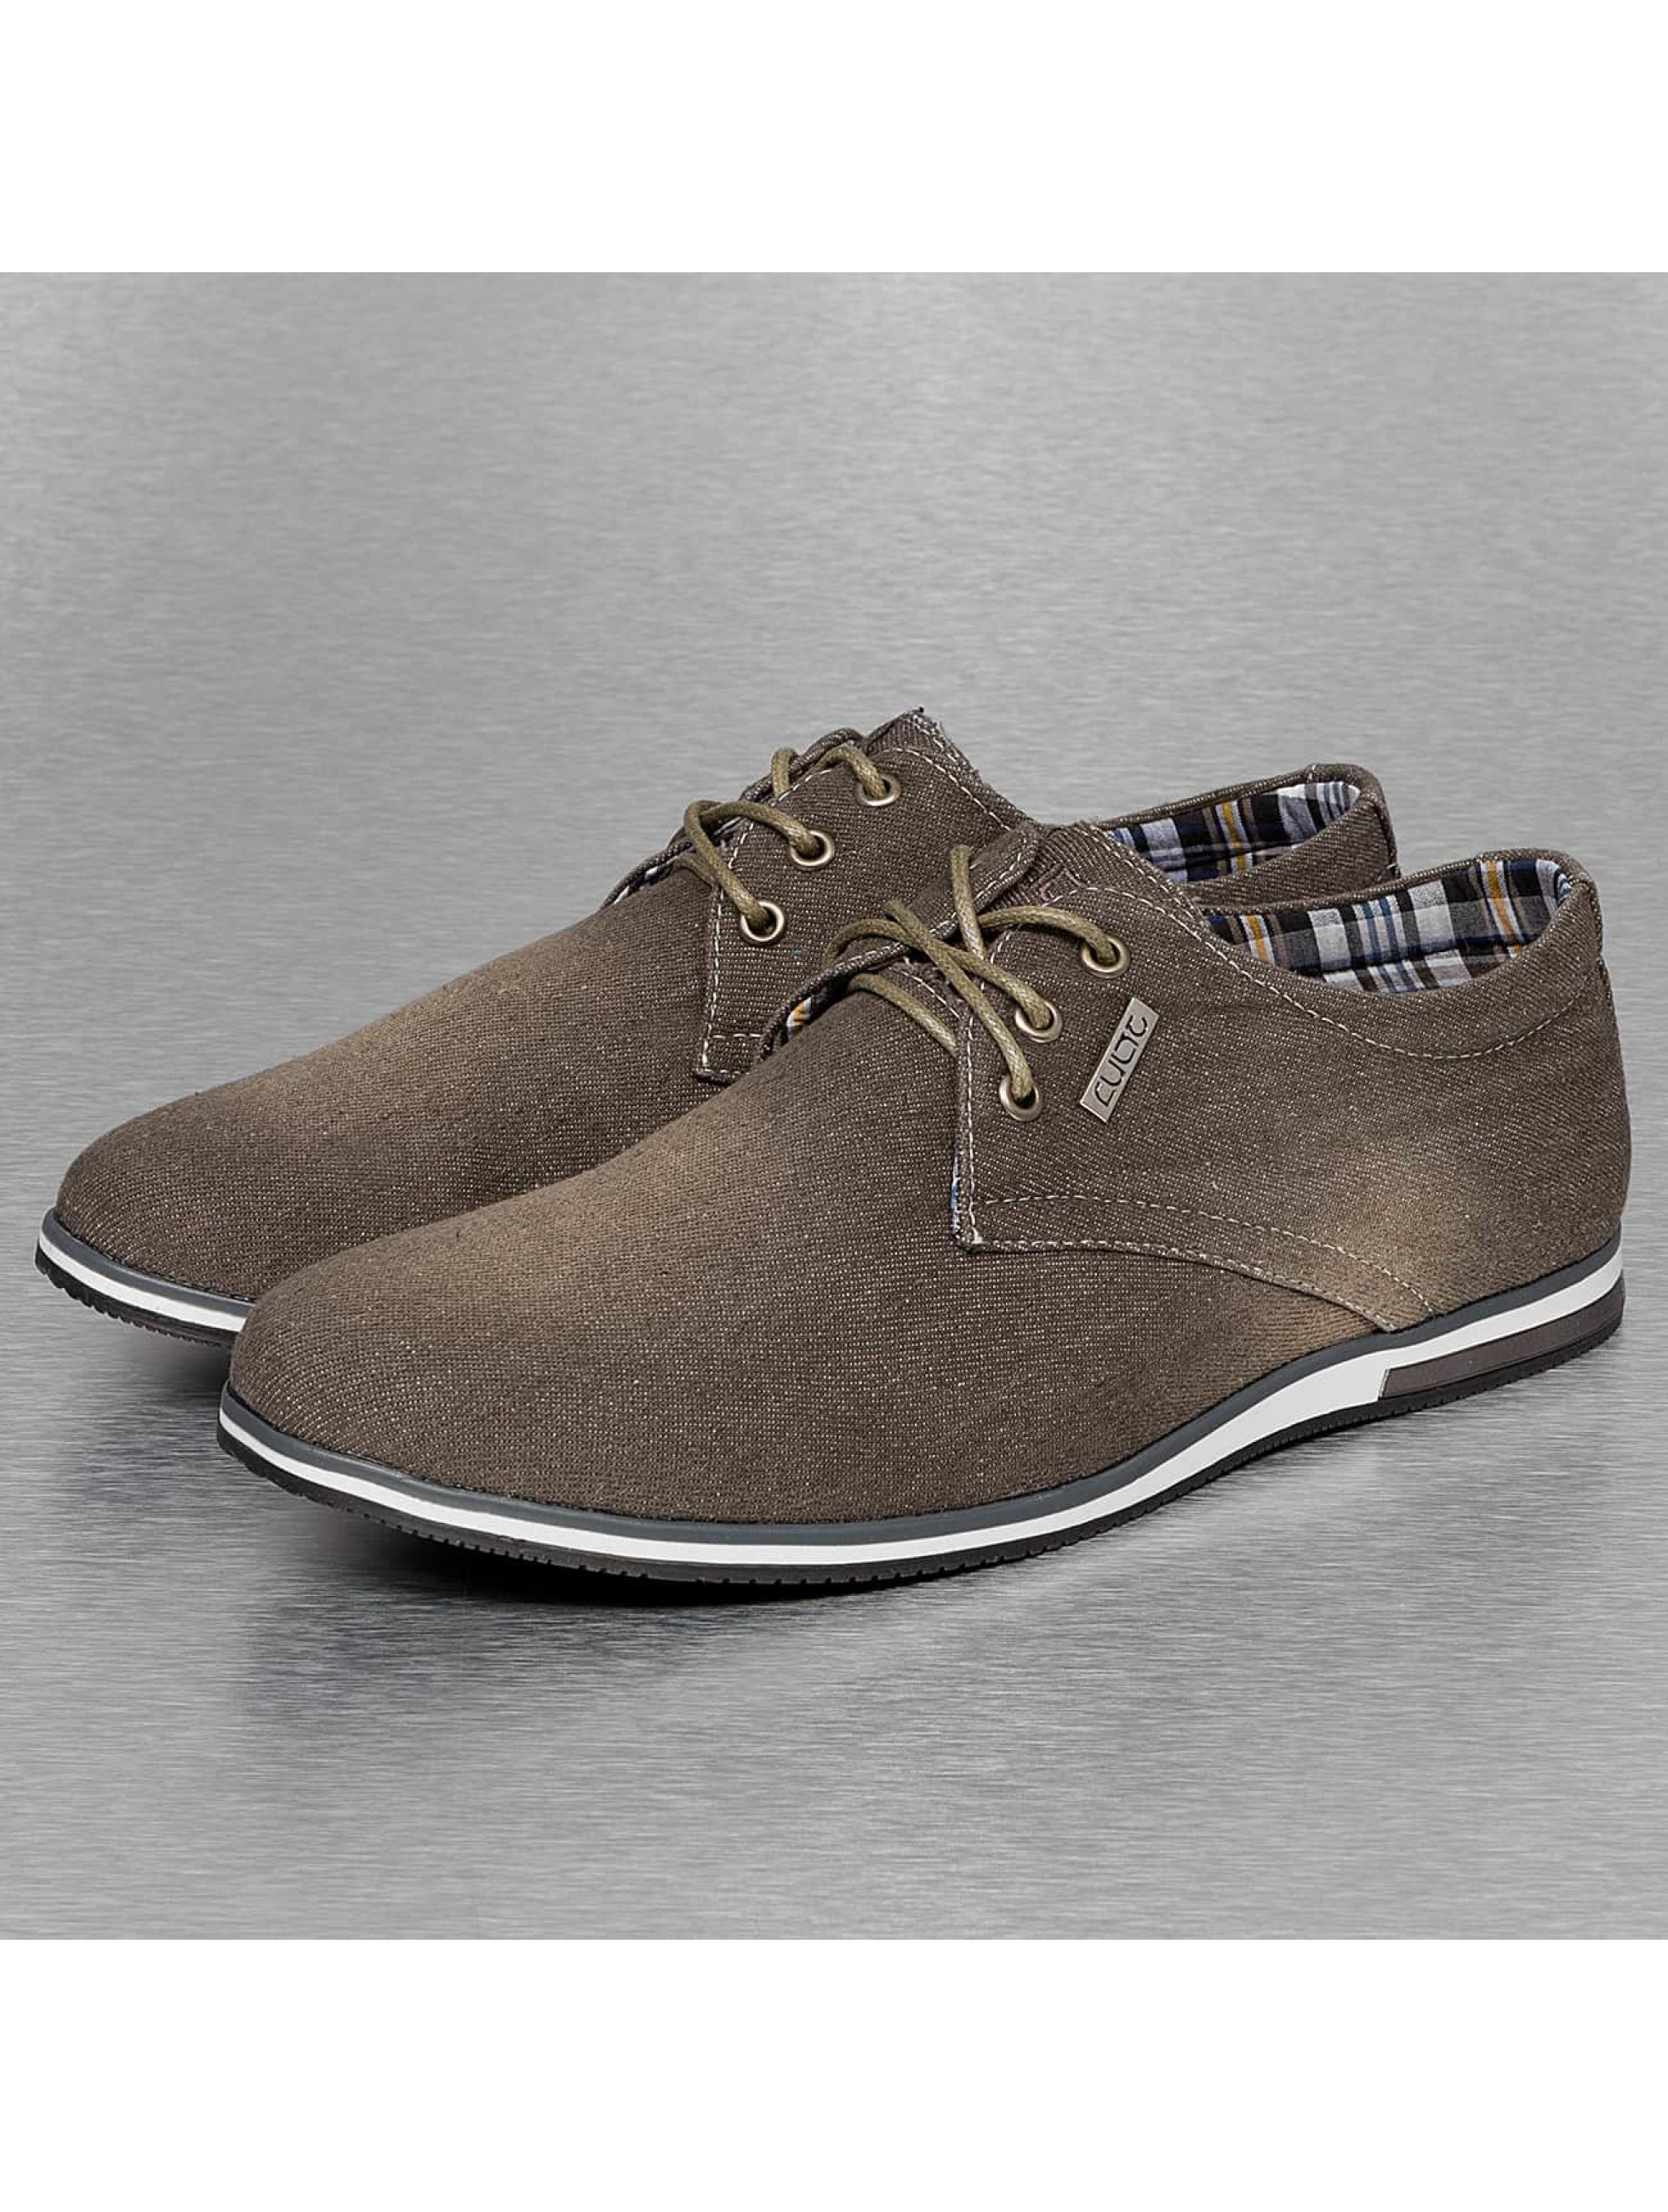 New York Style Sneakers Galway Denim khaki